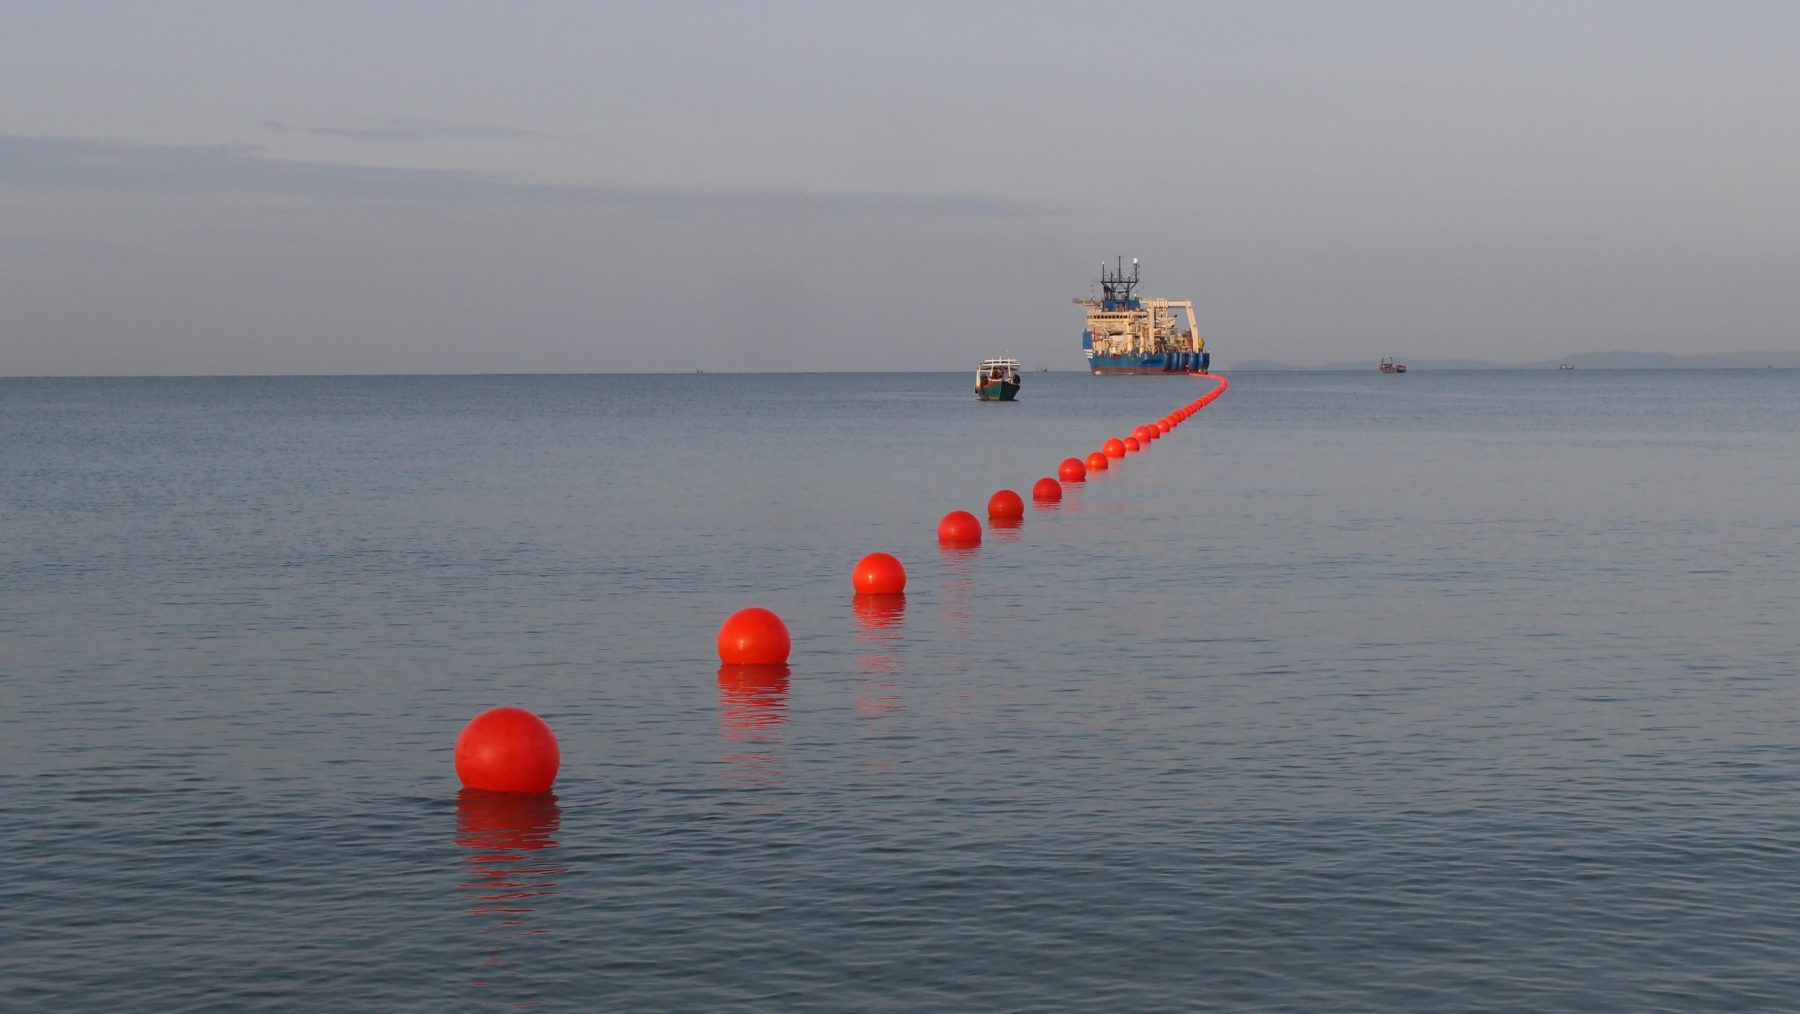 Malaysia Cambodia Thailand Submarine Cable System (MCT)